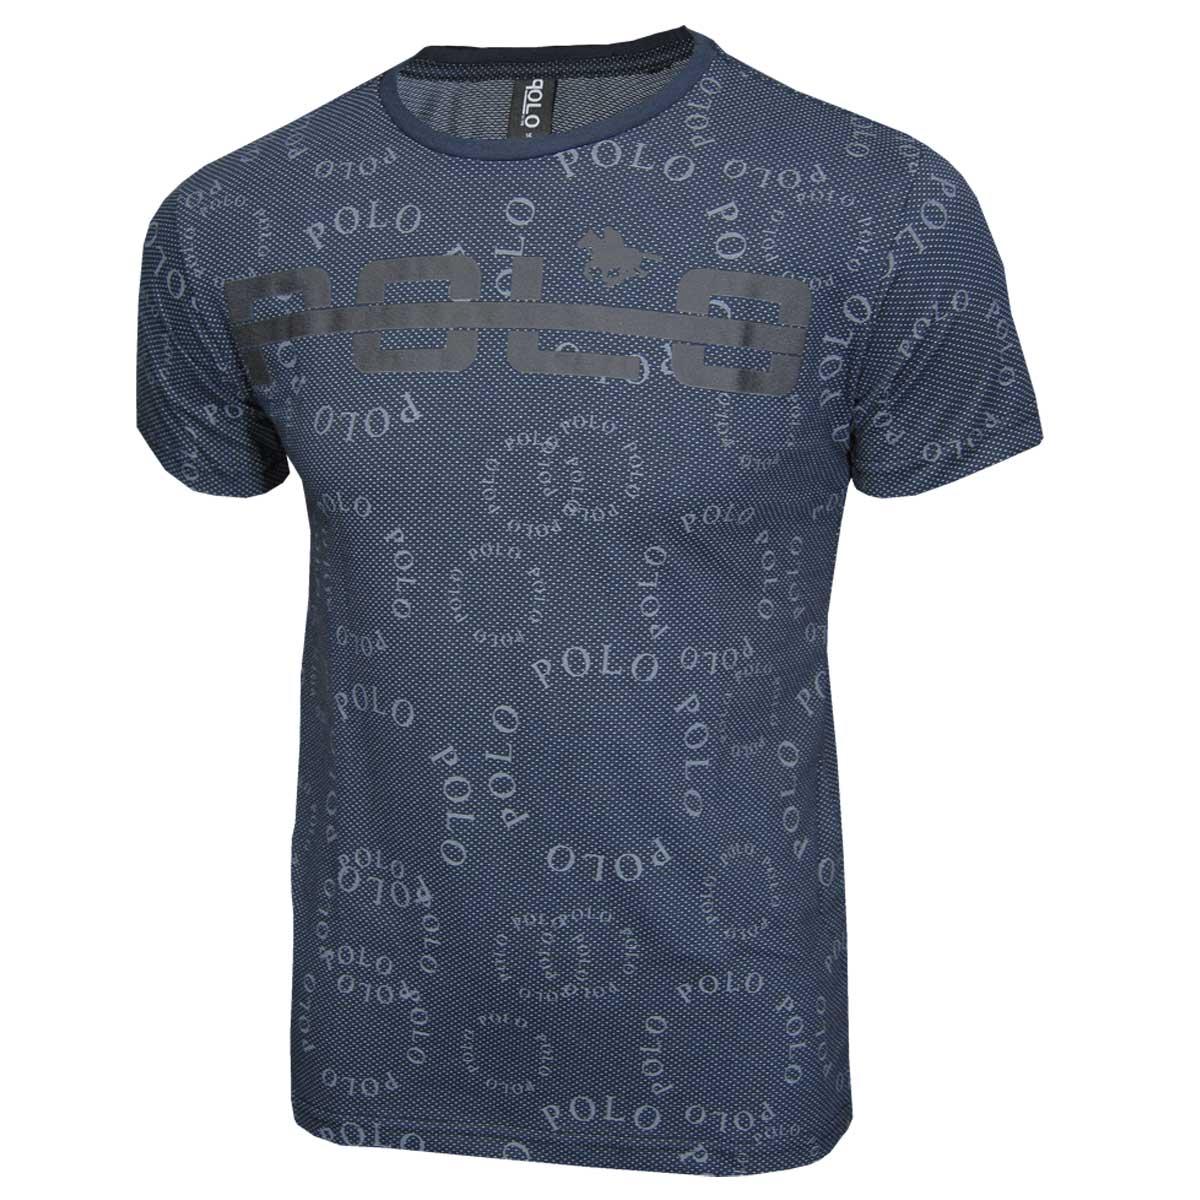 Camiseta Masculina Juvenil  Malha Pontilhada Polo RG518